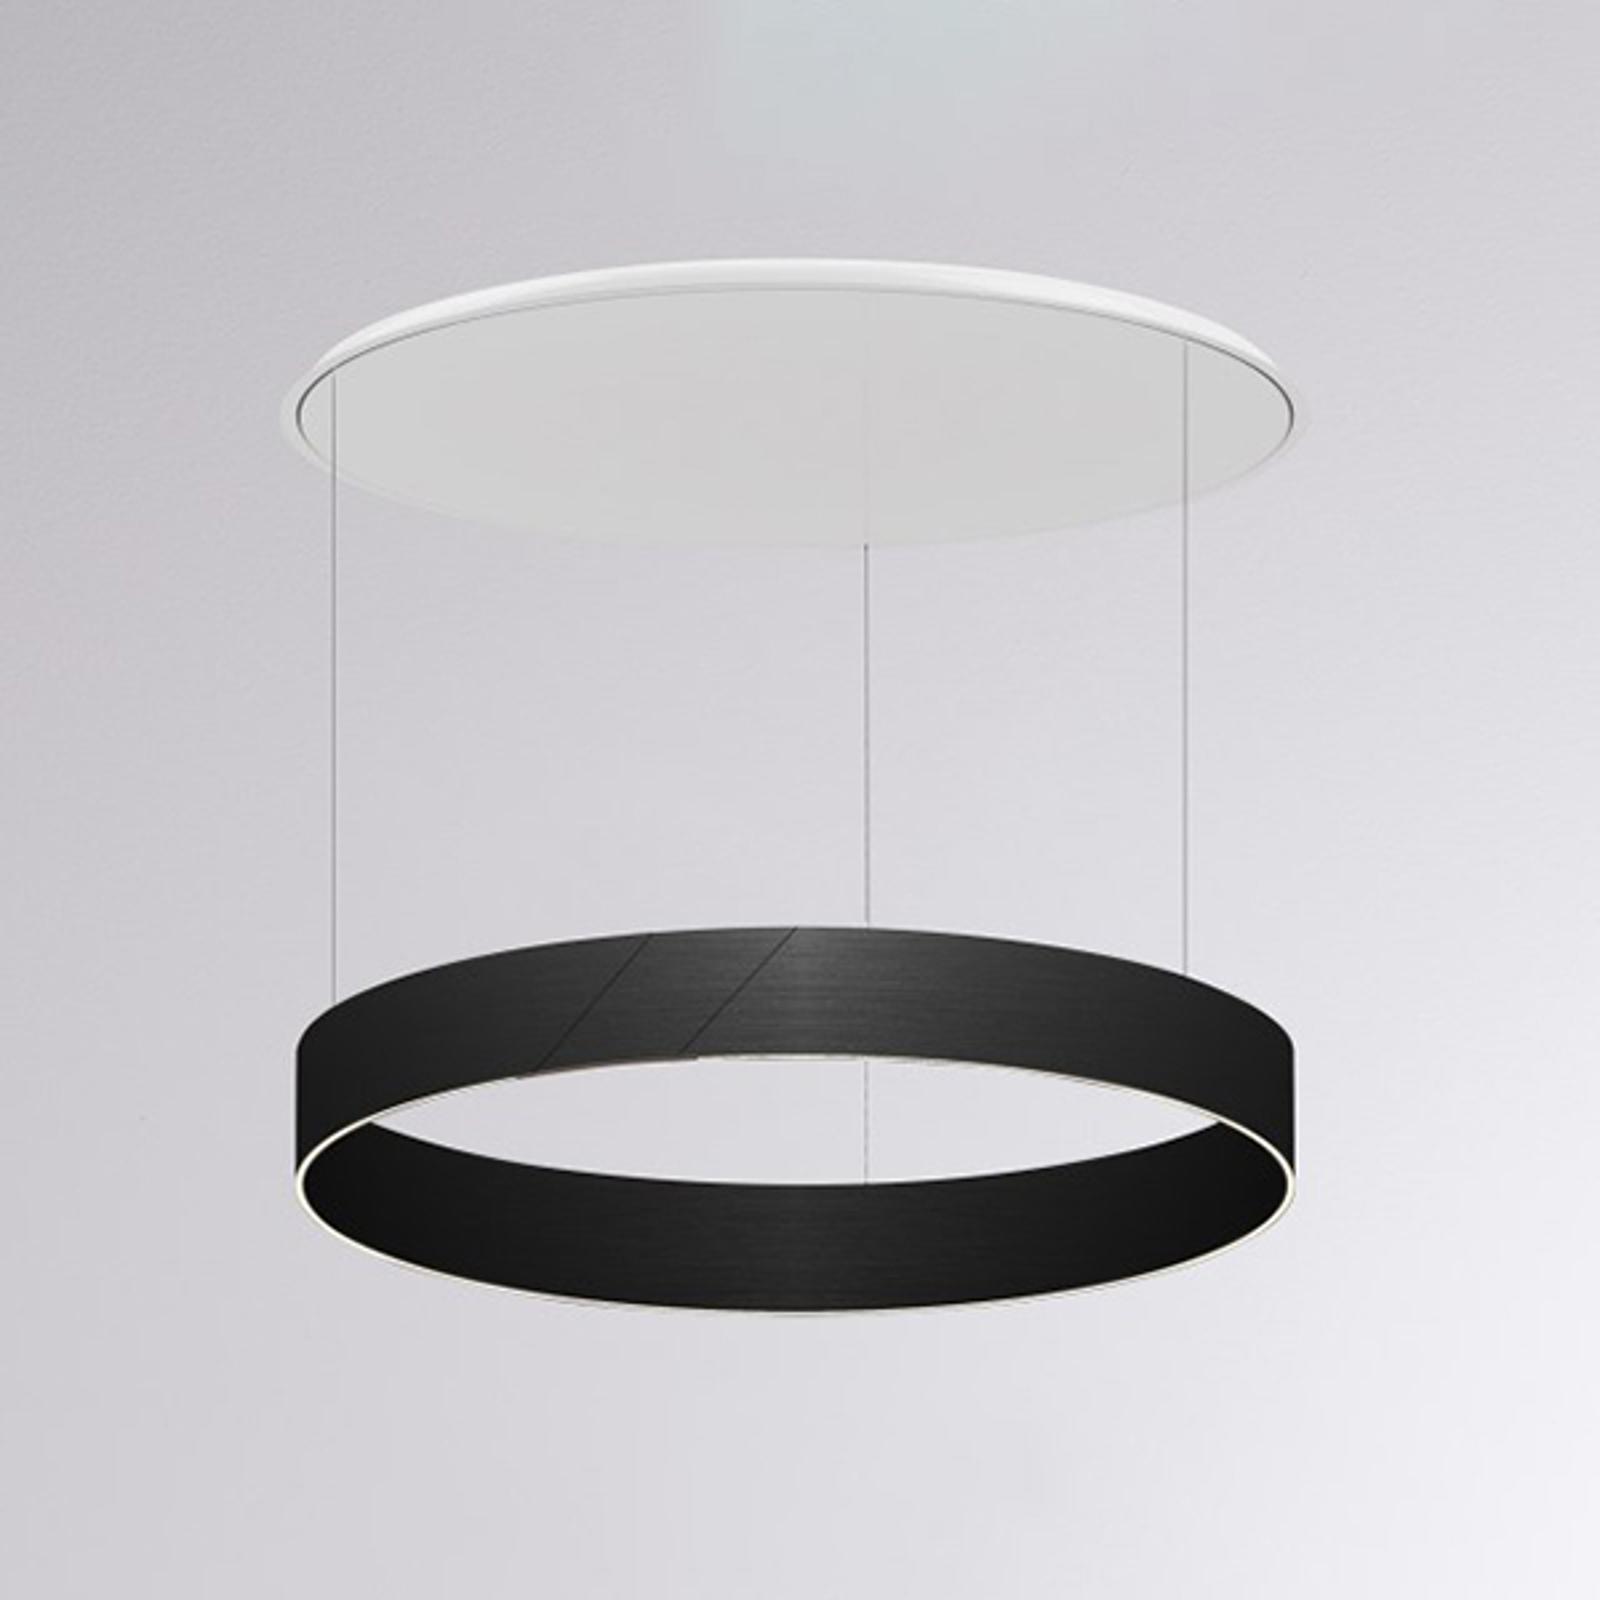 Lampa wisząca LED After 8 Round 1-10V czarna